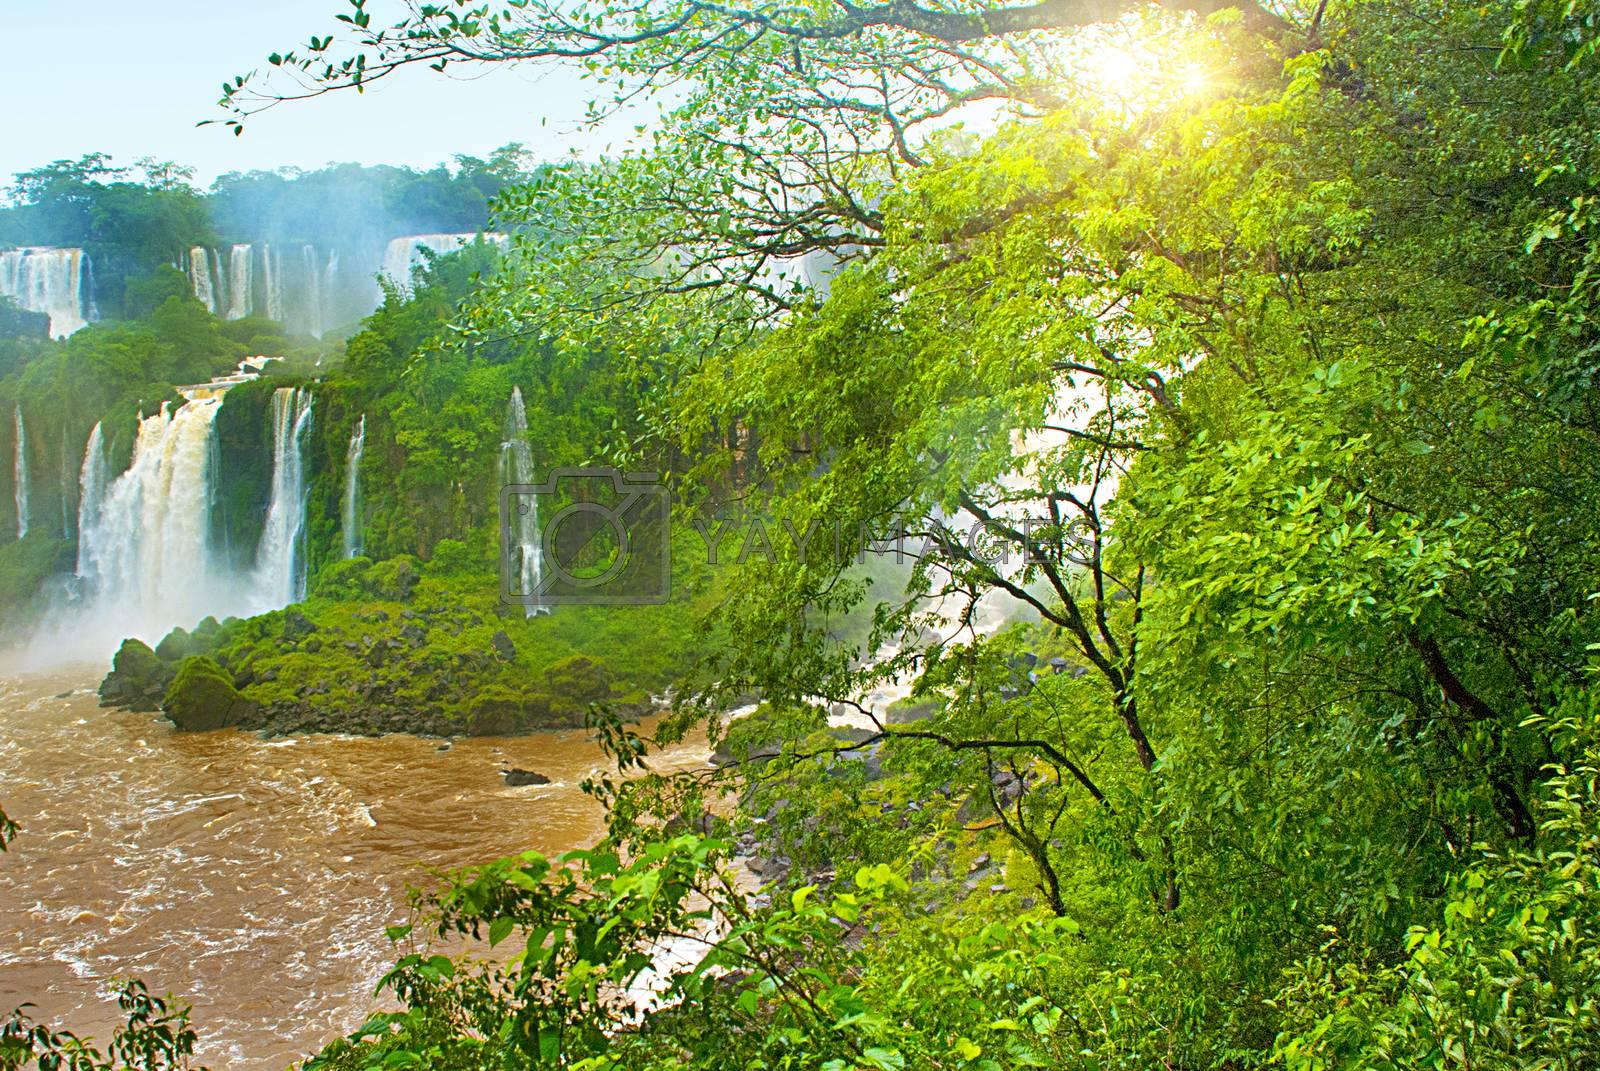 ARGENTINA, IGUAZU: Beatiful view point of Iguazu falls, one of the world's great natural wonders. Peurto Iguazu, Argentina. UNESCO World Heritage site.